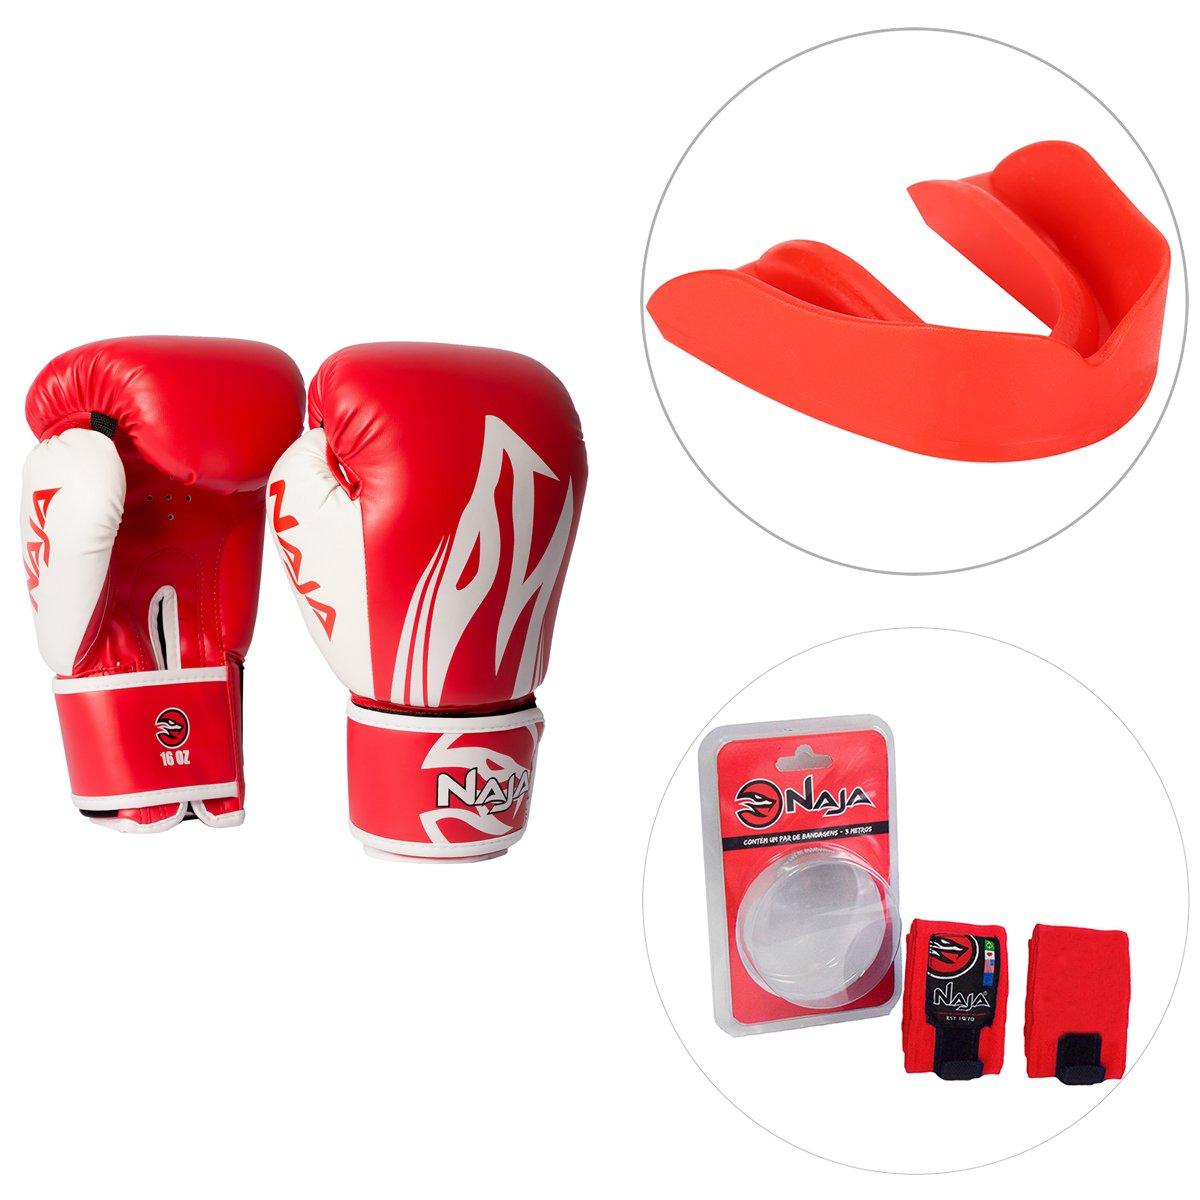 e70dc0a60 Kit Luva de Boxe   Muay Thai Naja Extreme 10OZ + Bandagem Elástica 3M +  Protetor ...